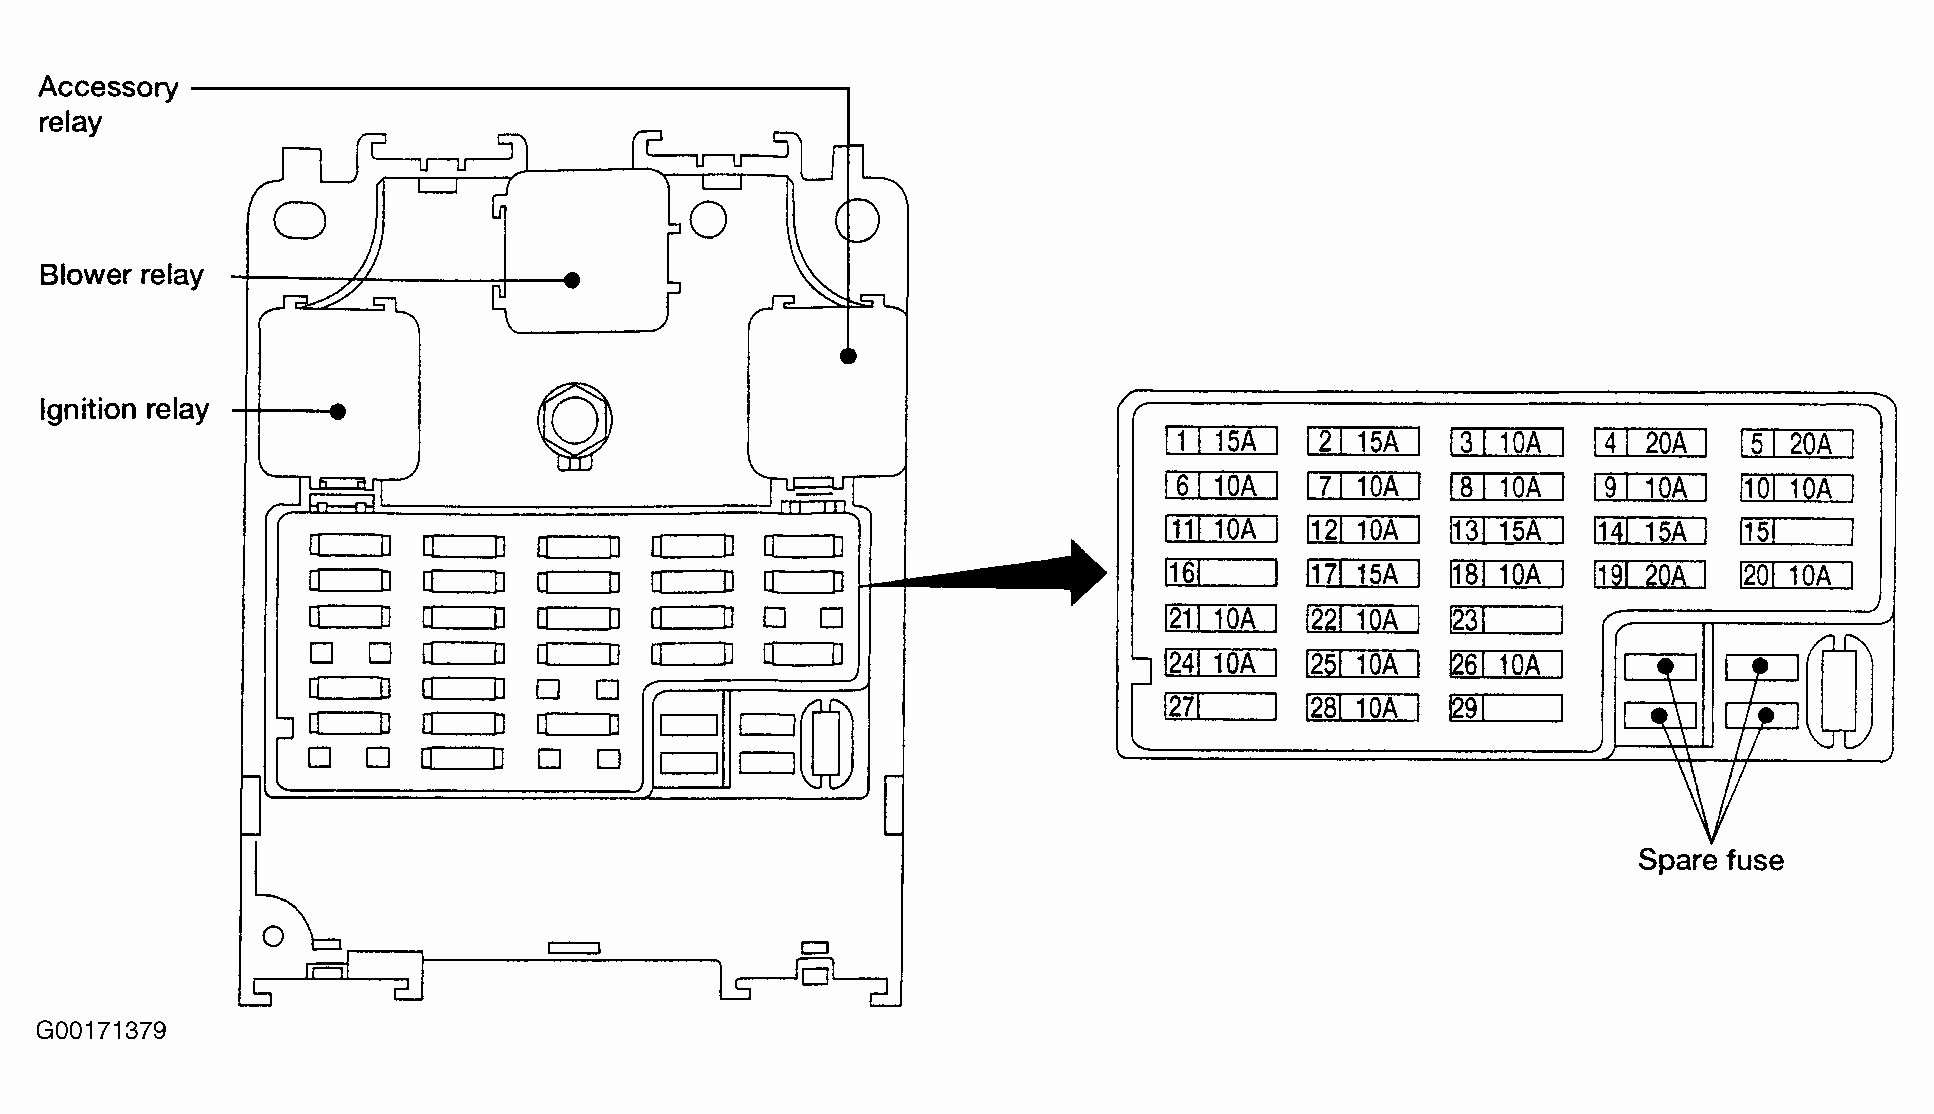 Power Window Diagram Wiring Diagram Symbols Automotive – Ipphil Of Power Window Diagram